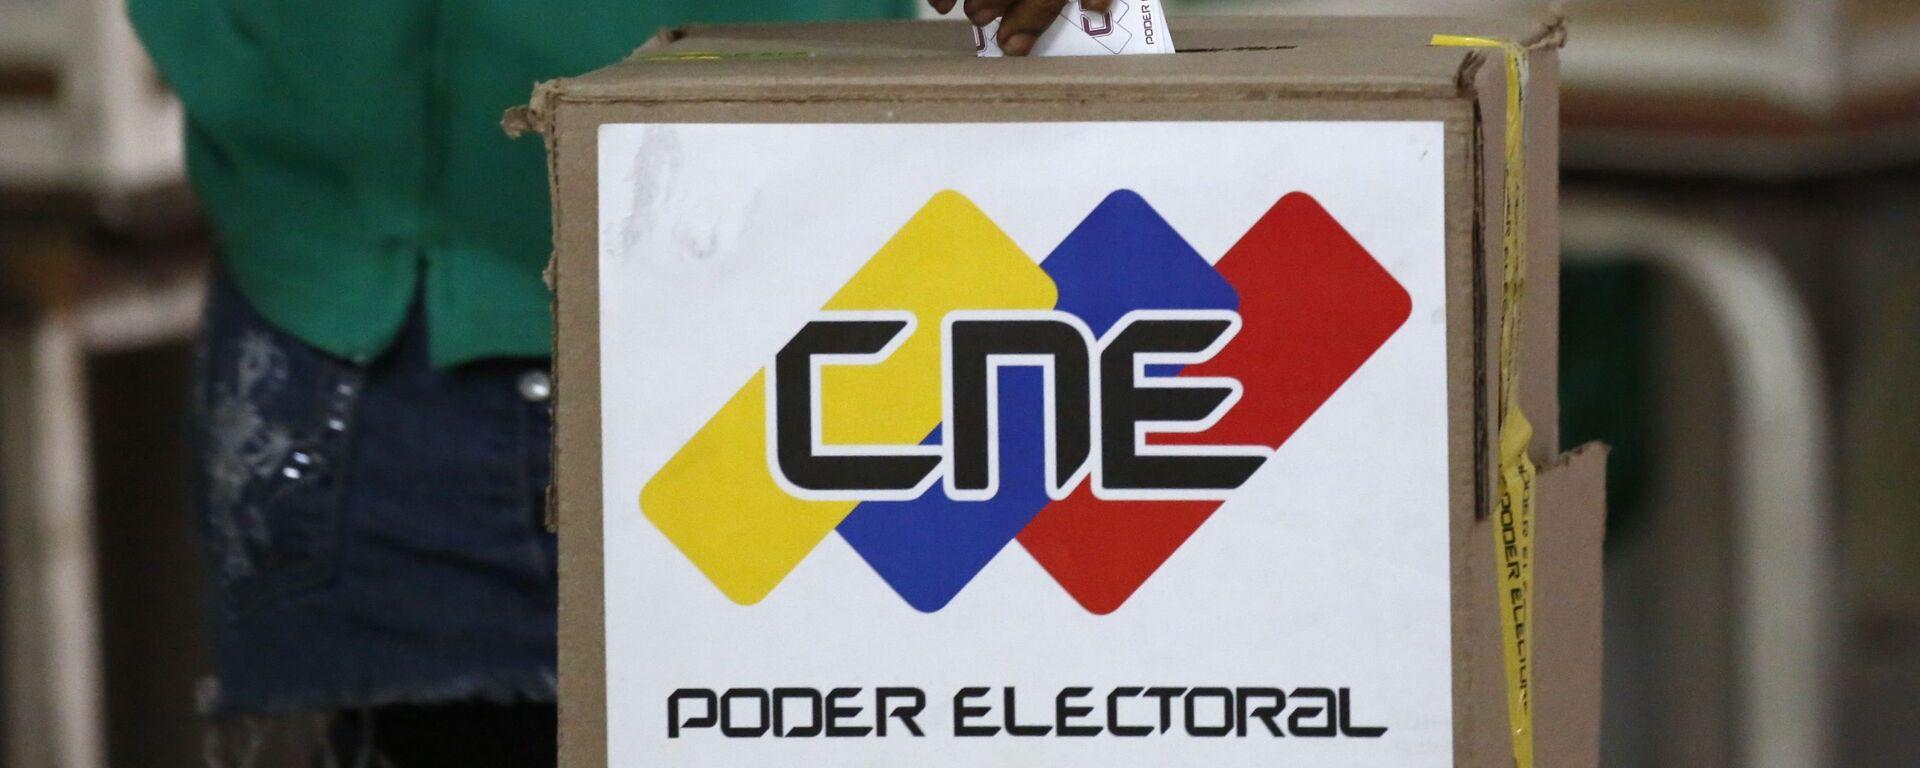 A voter casts a ballot during the Constituent Assembly election in Caracas, Venezuela - Sputnik Mundo, 1920, 24.05.2021